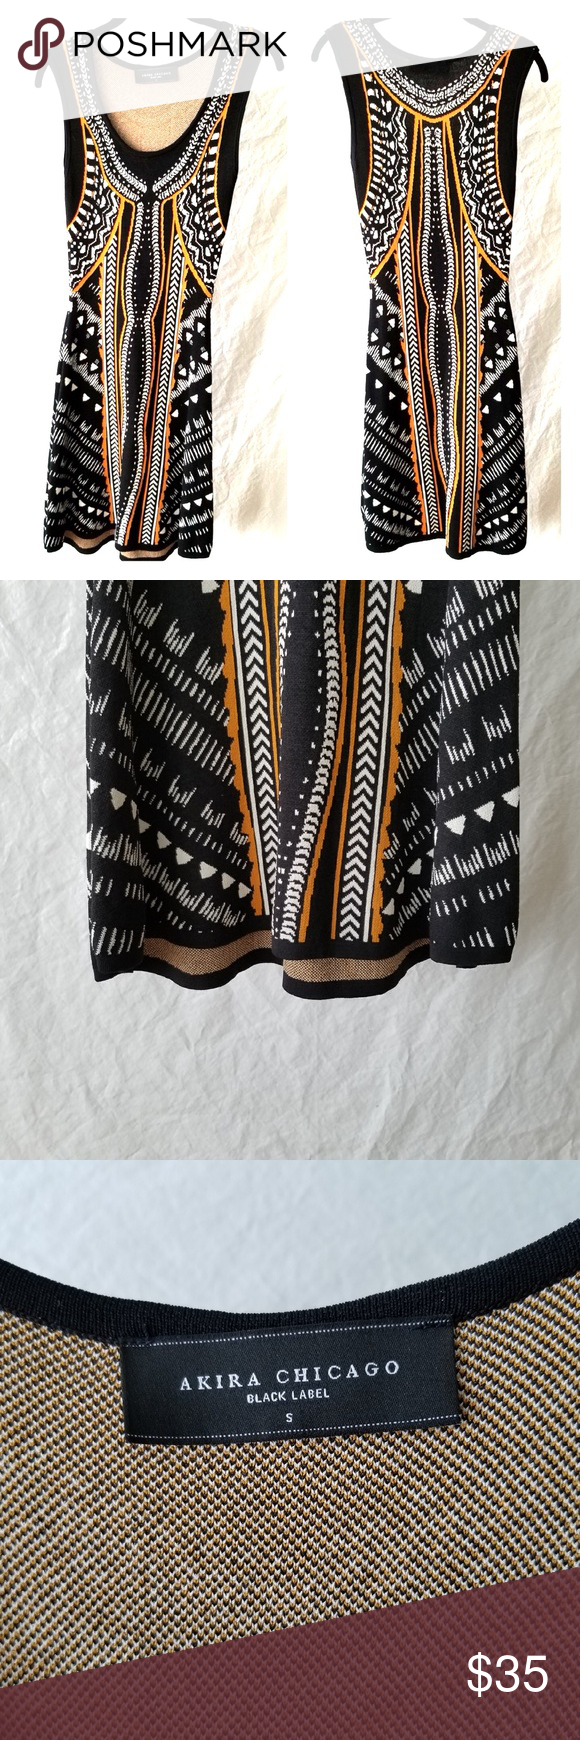 Akira Chicago Black Label Bold Print Dress Stunning